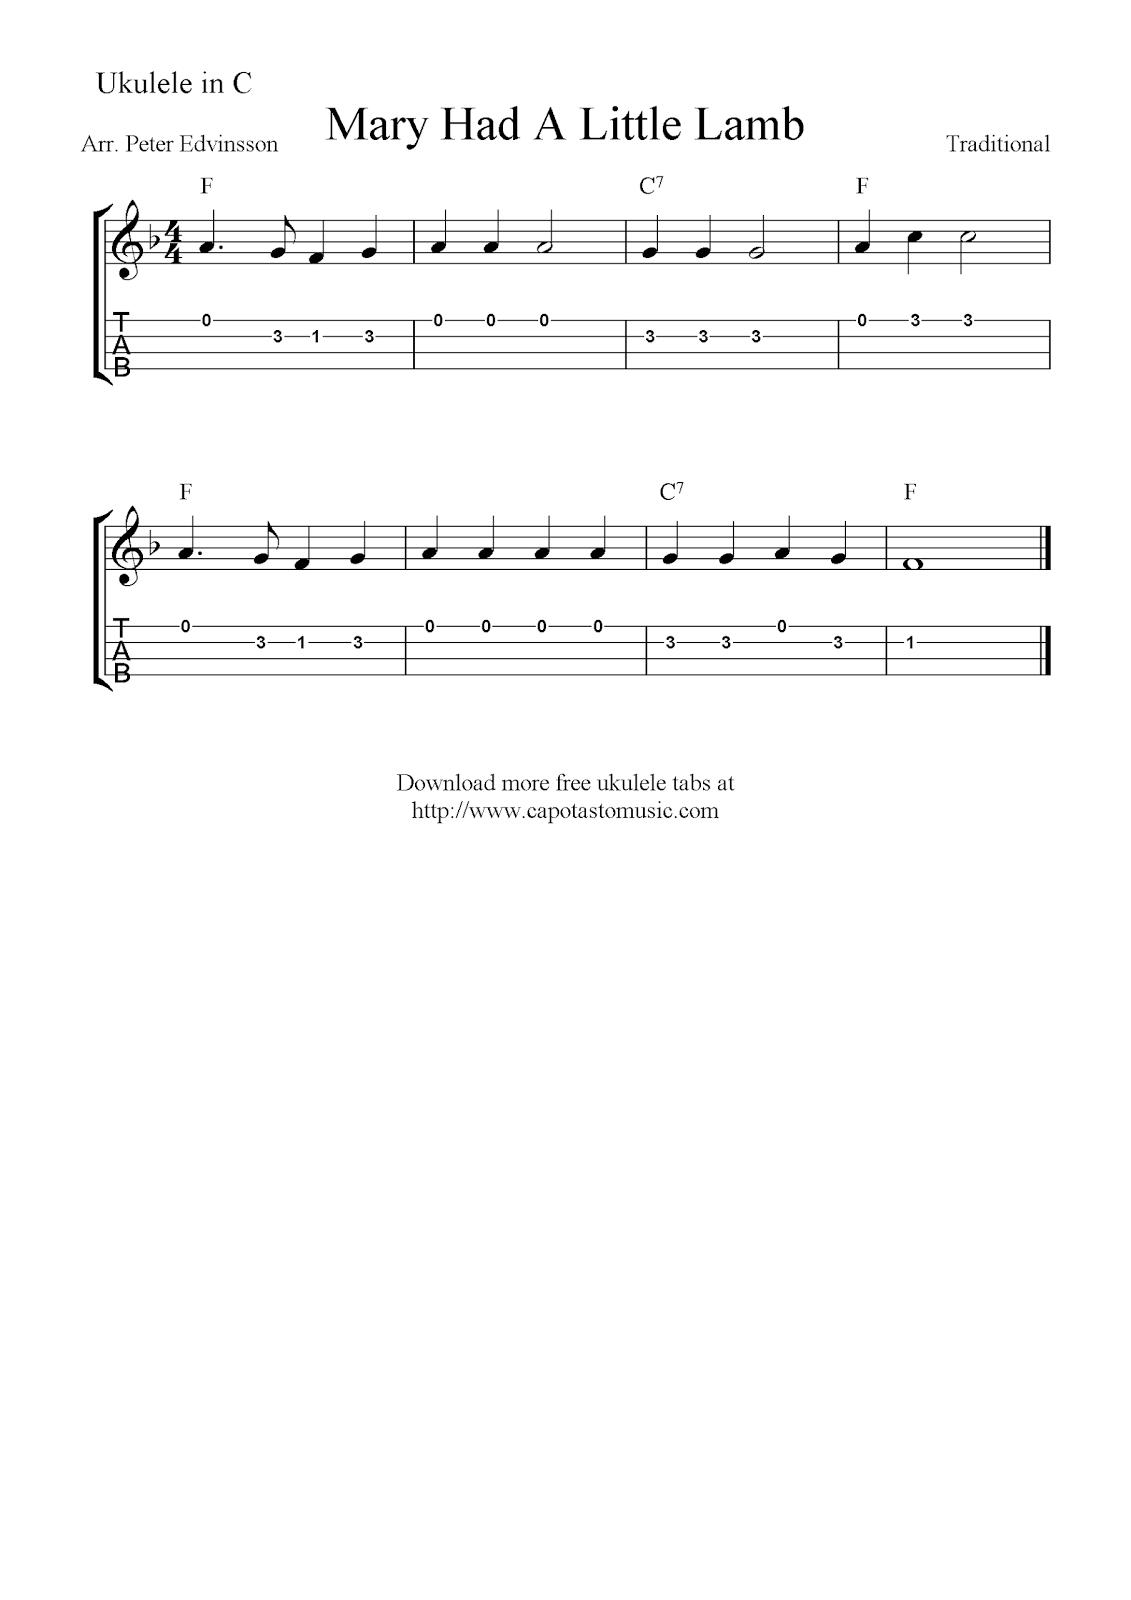 Mary Had A Little Lamb, free ukulele tablature sheet music notes